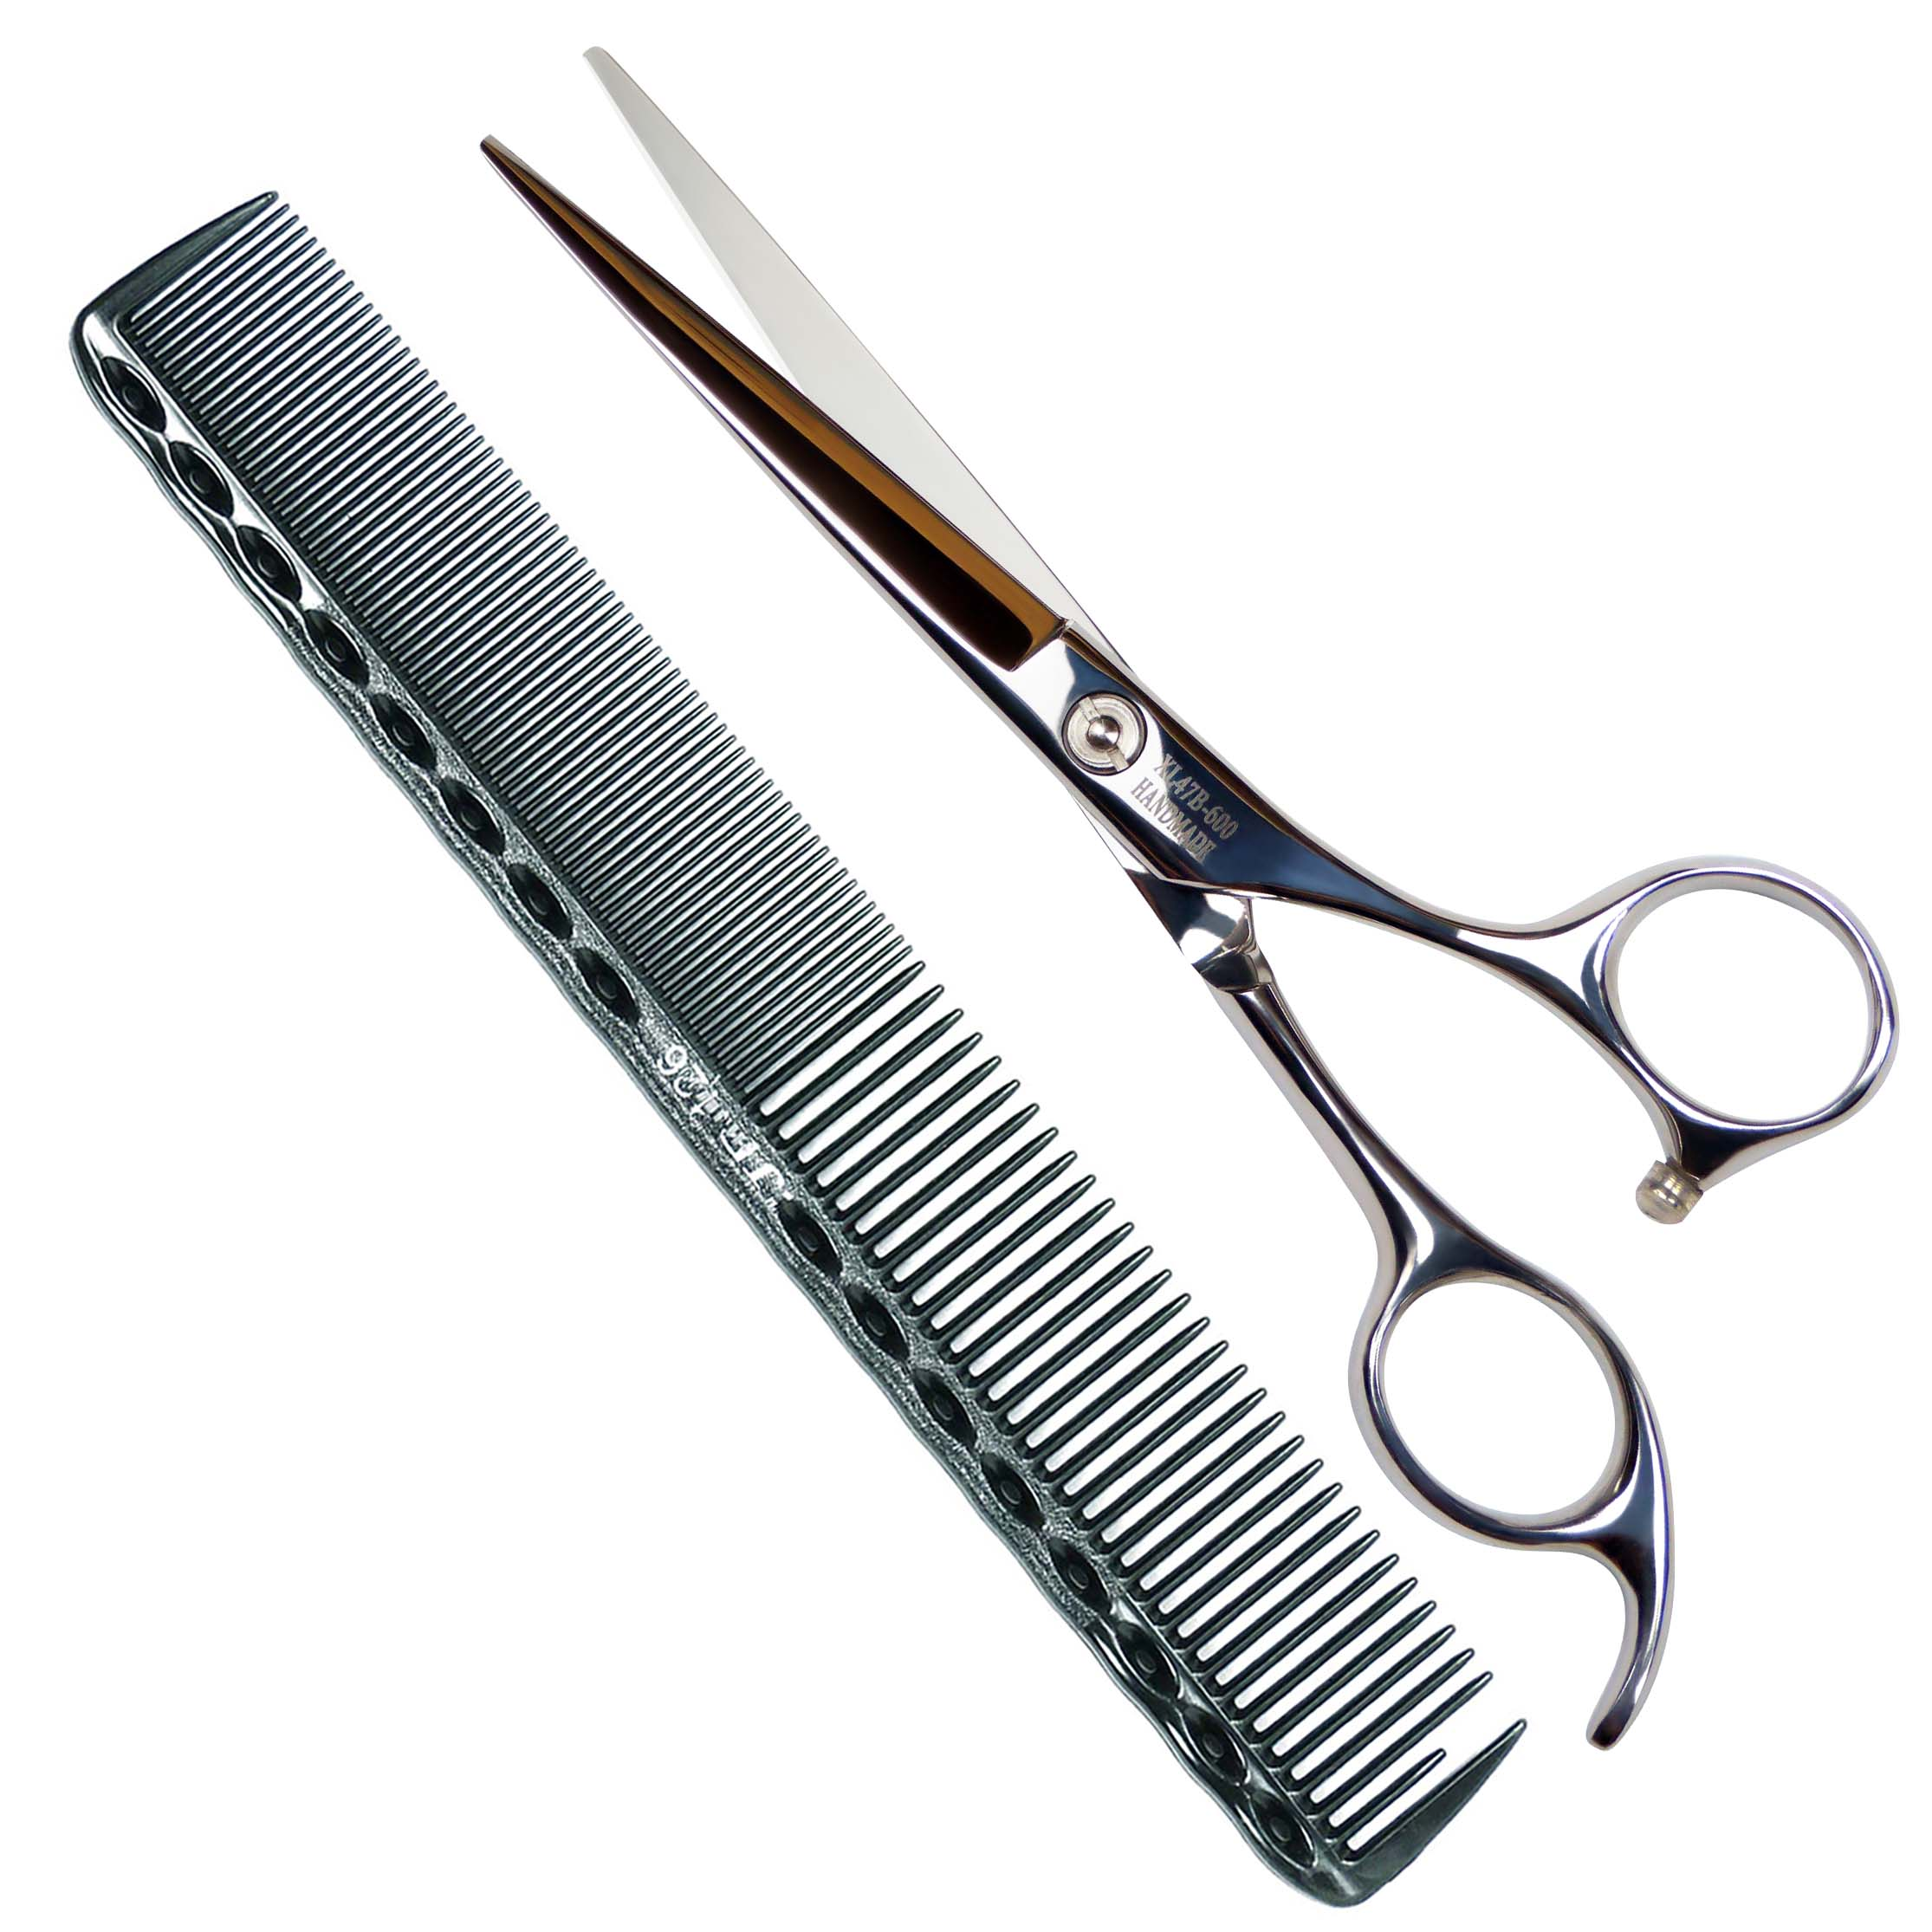 Professional Barber Hair Cutting Shears / Scissors, 6 Inch ...